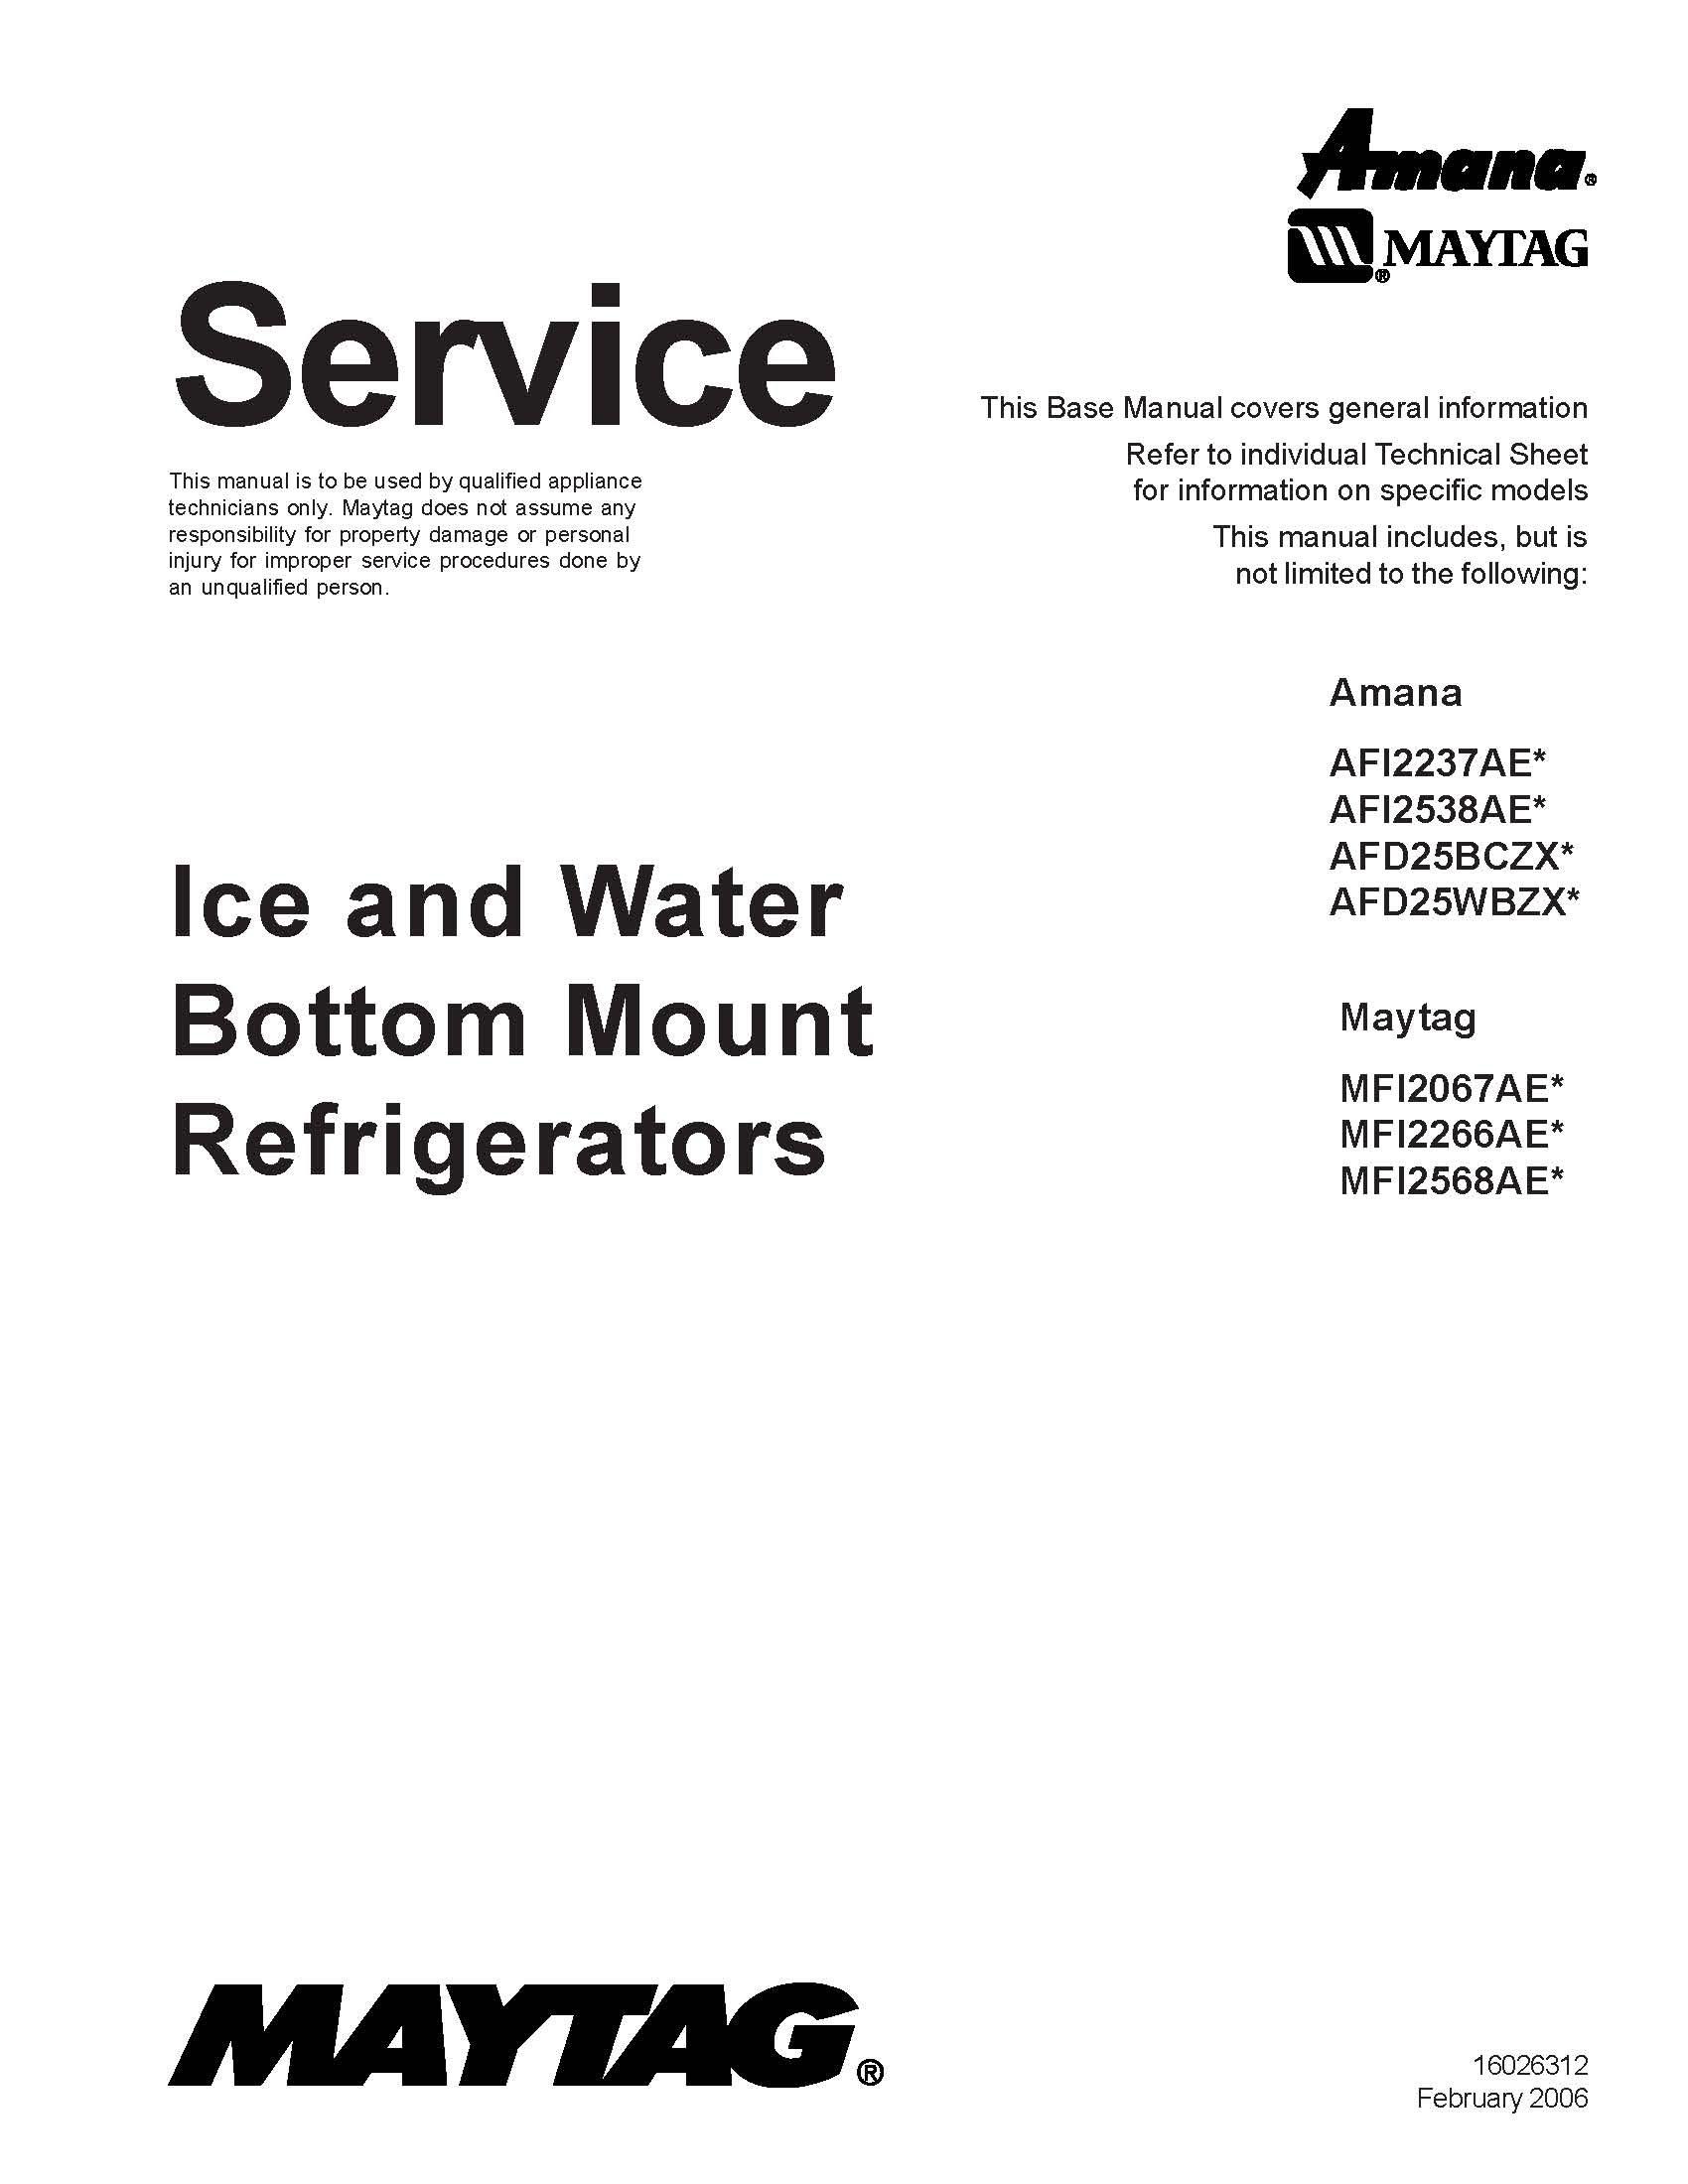 maytag mfi2568aes service manual maytag 0912345256809 amazon com rh amazon com MFI2568AES Recall Water Filter for Maytag MFI2568AES